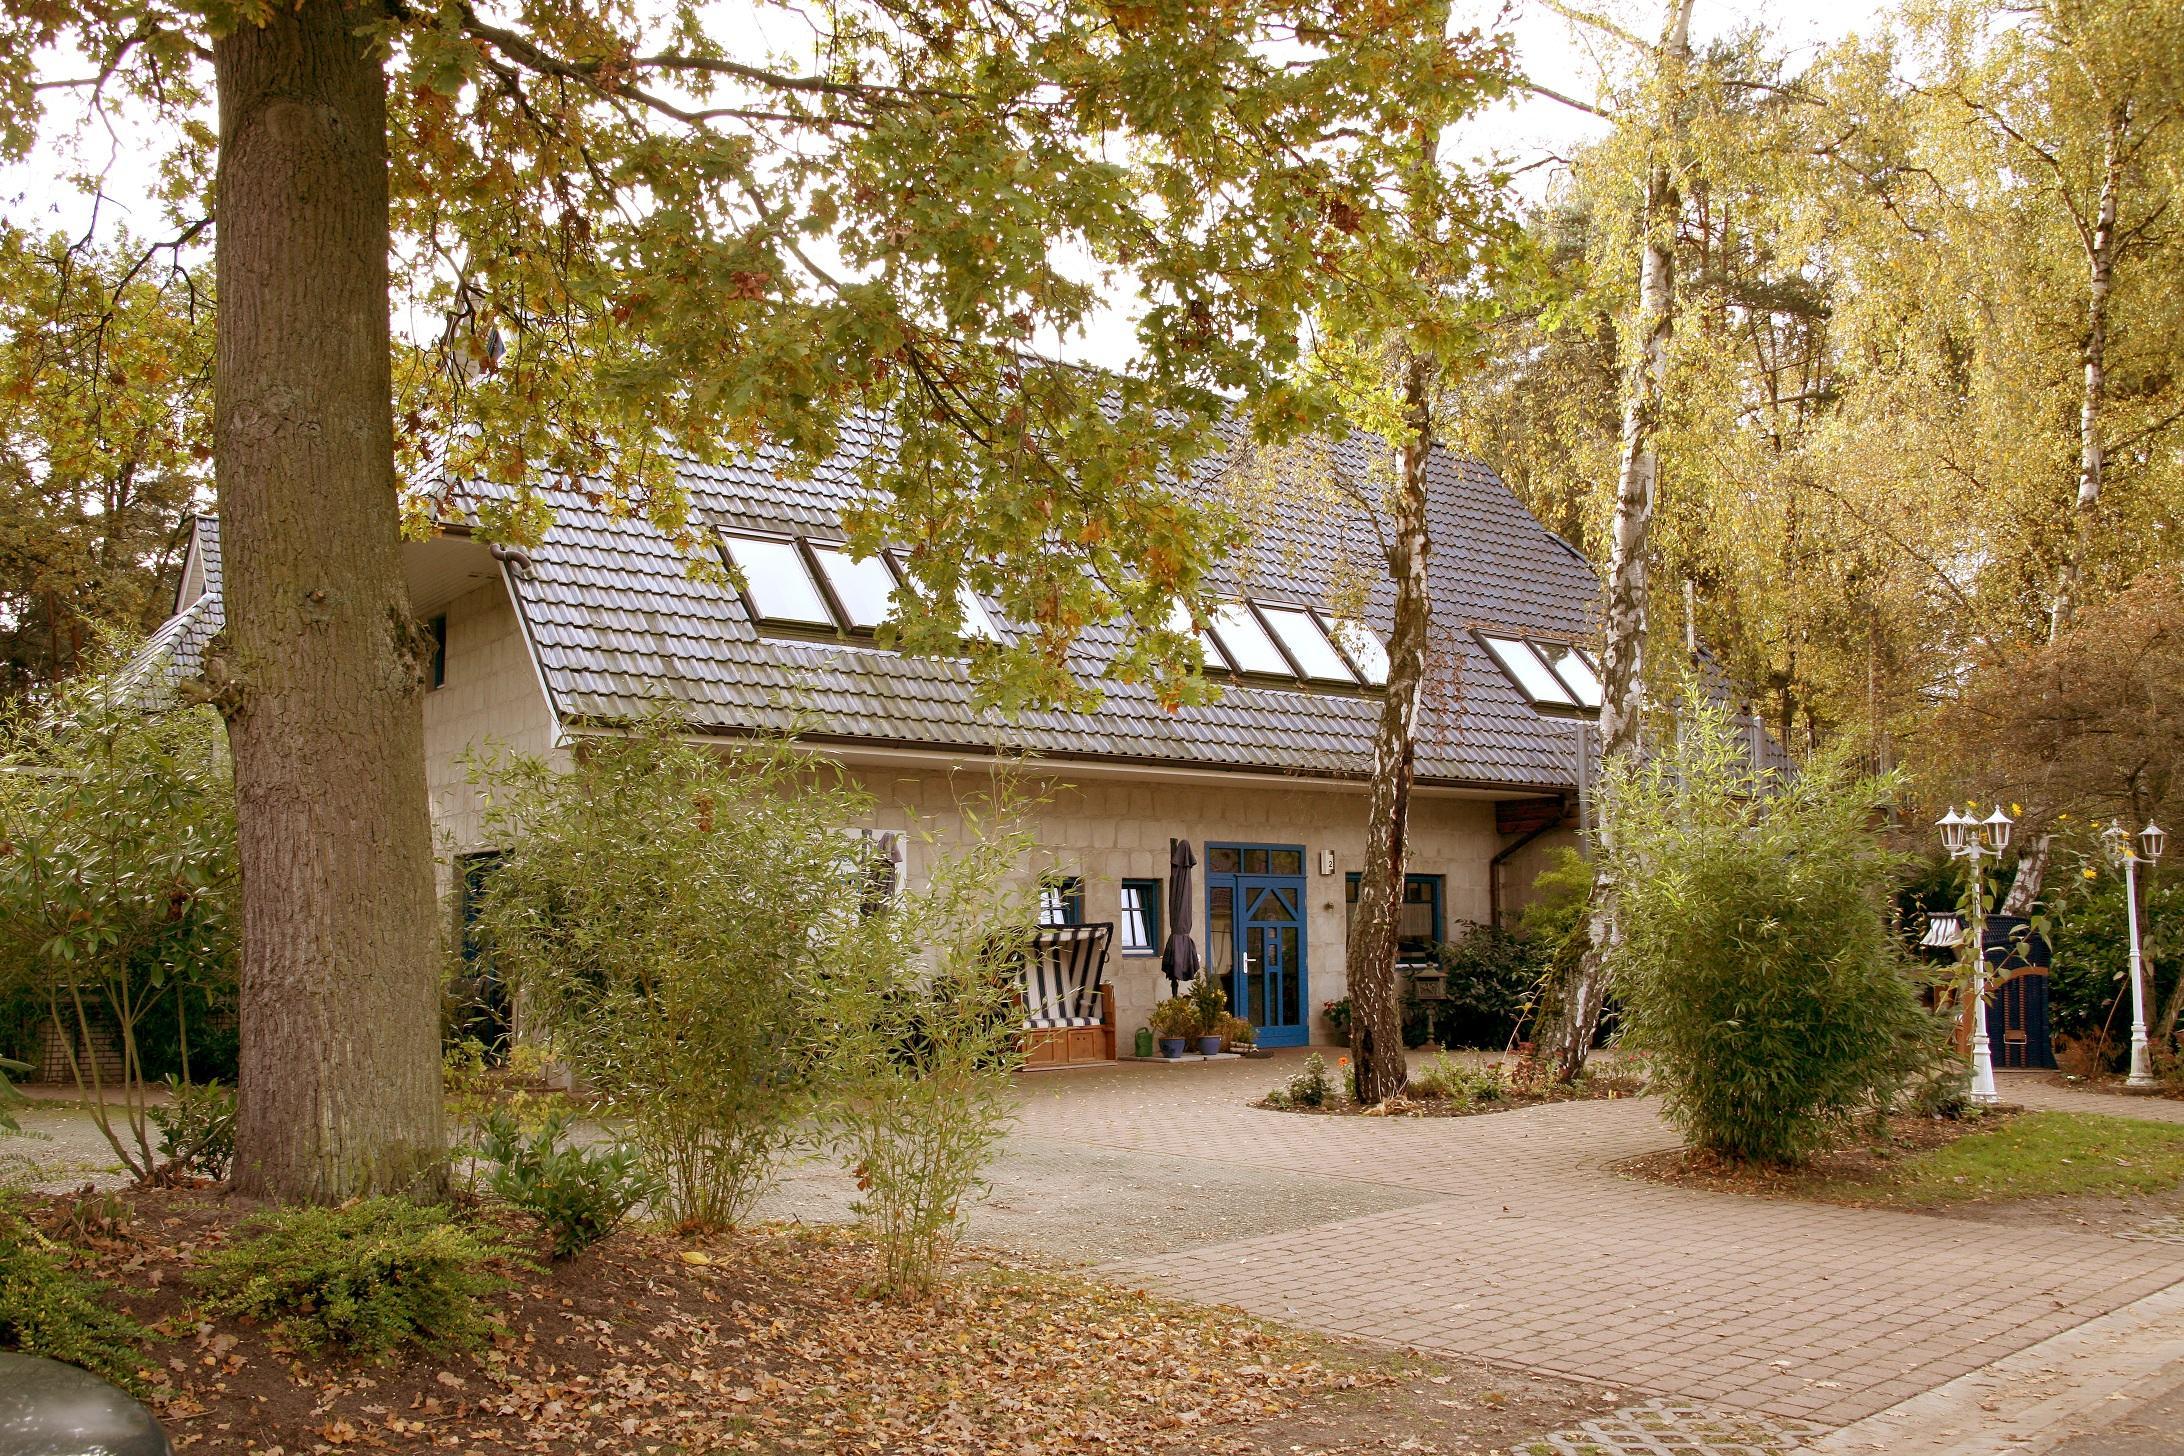 Seniorenpflegeheim Waldgarten